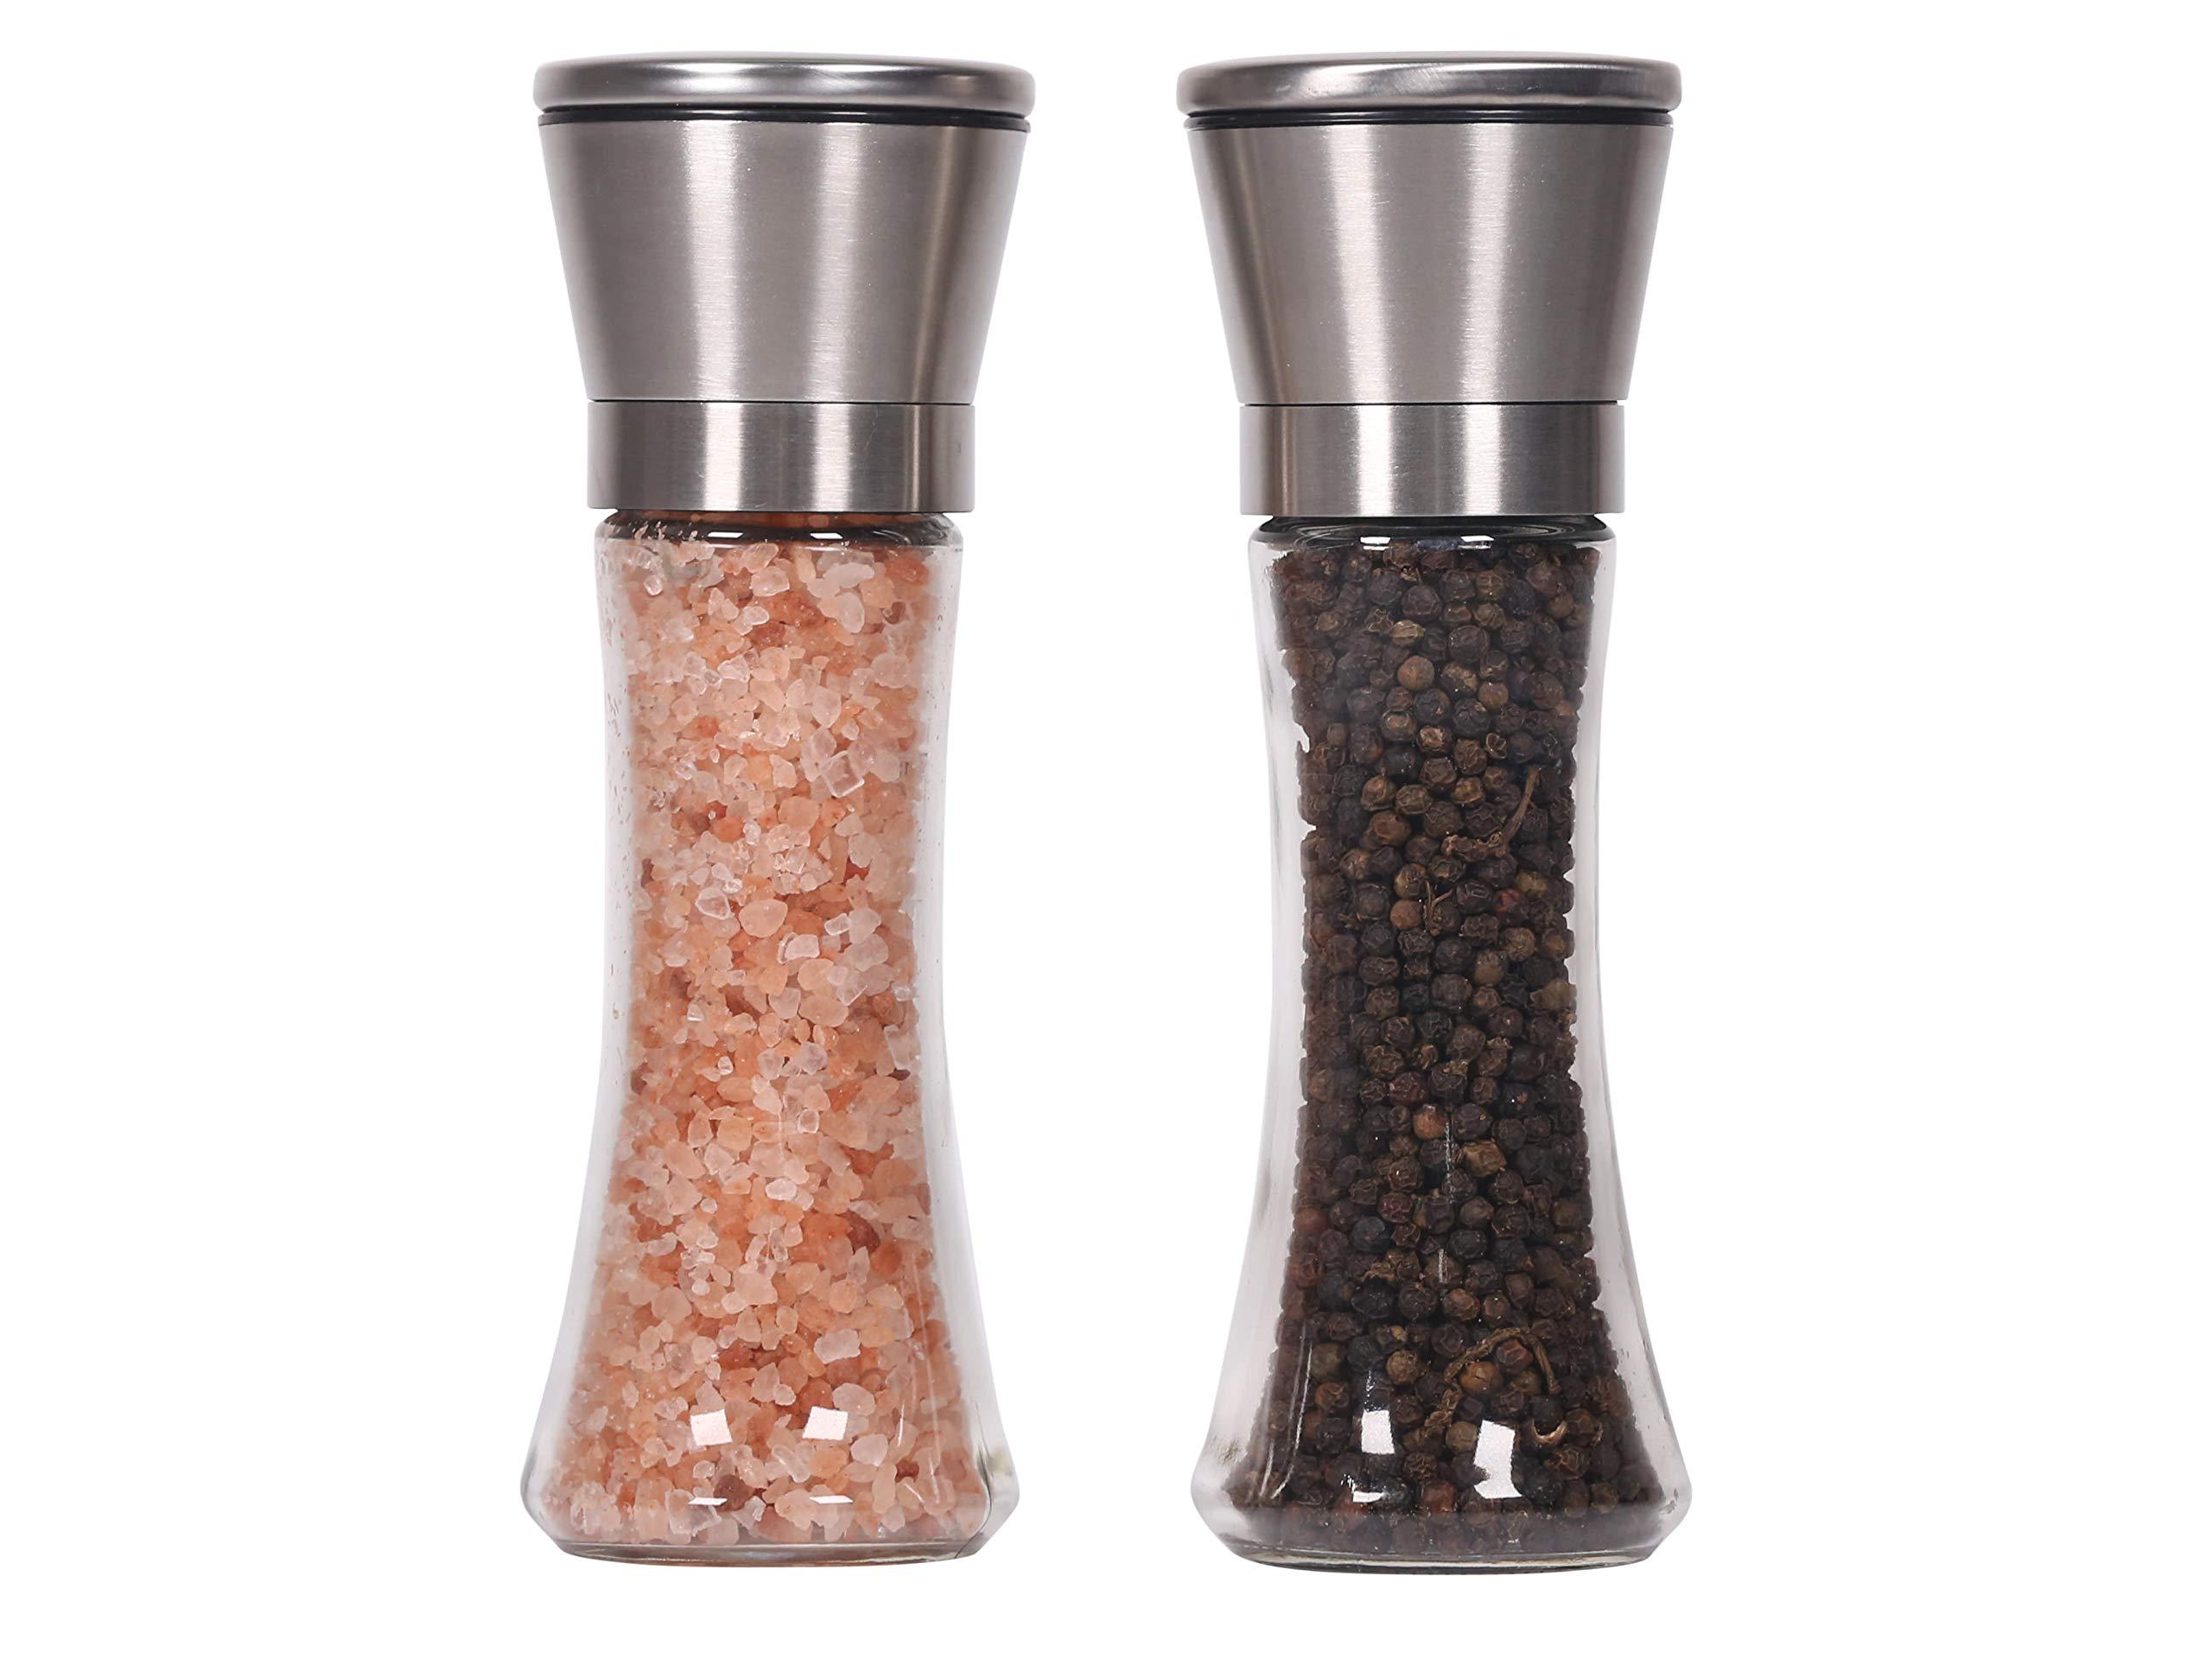 Luxurious Stainless Steel Salt and Pepper Grinder Set of 2 - Adjustable Ceramic Sea Salt Grinder & Pepper Grinder - Tall Glass Salt and Pepper Shakers - Decorative Impressive on Table